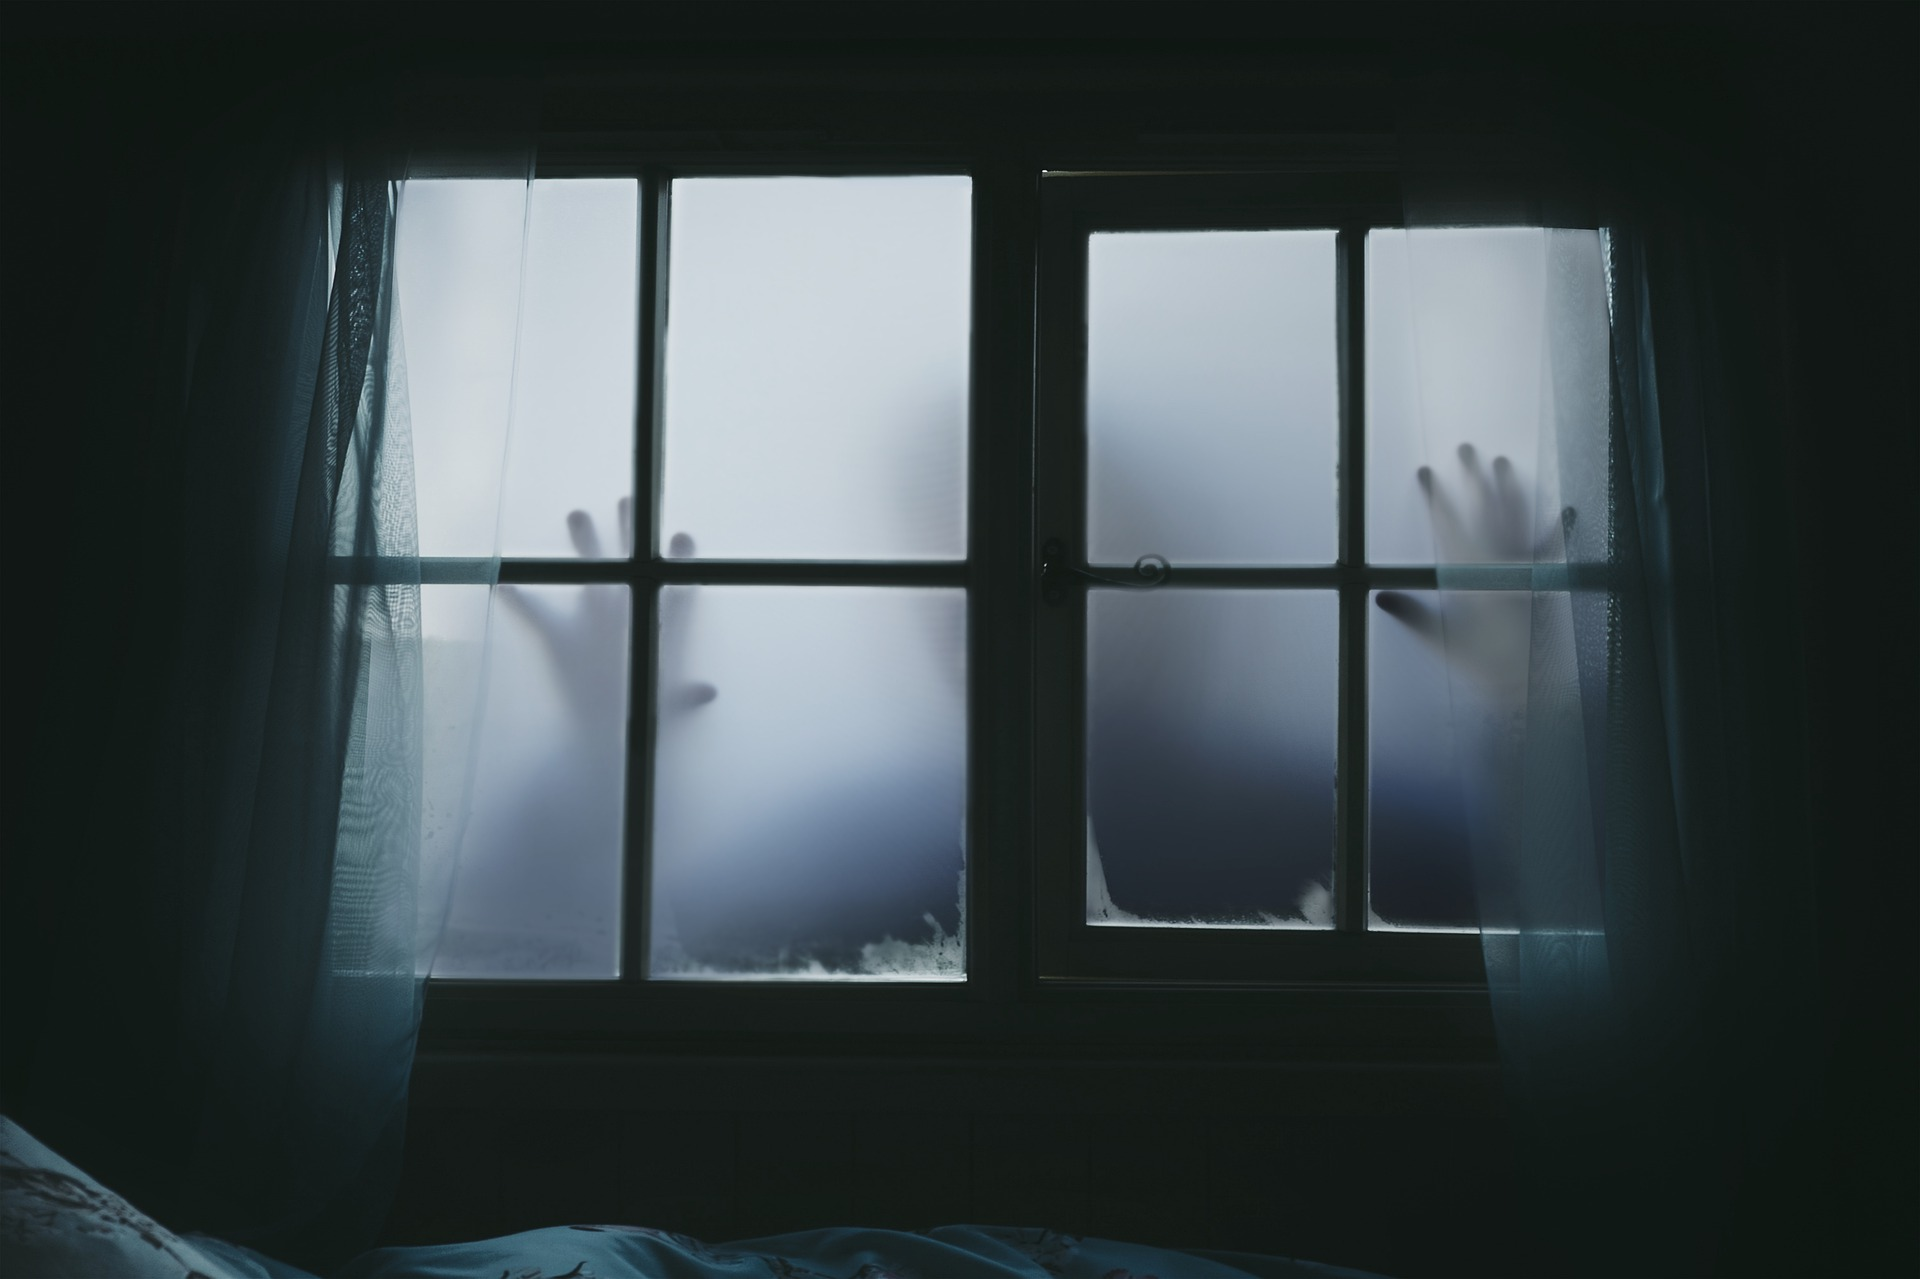 paura finestre